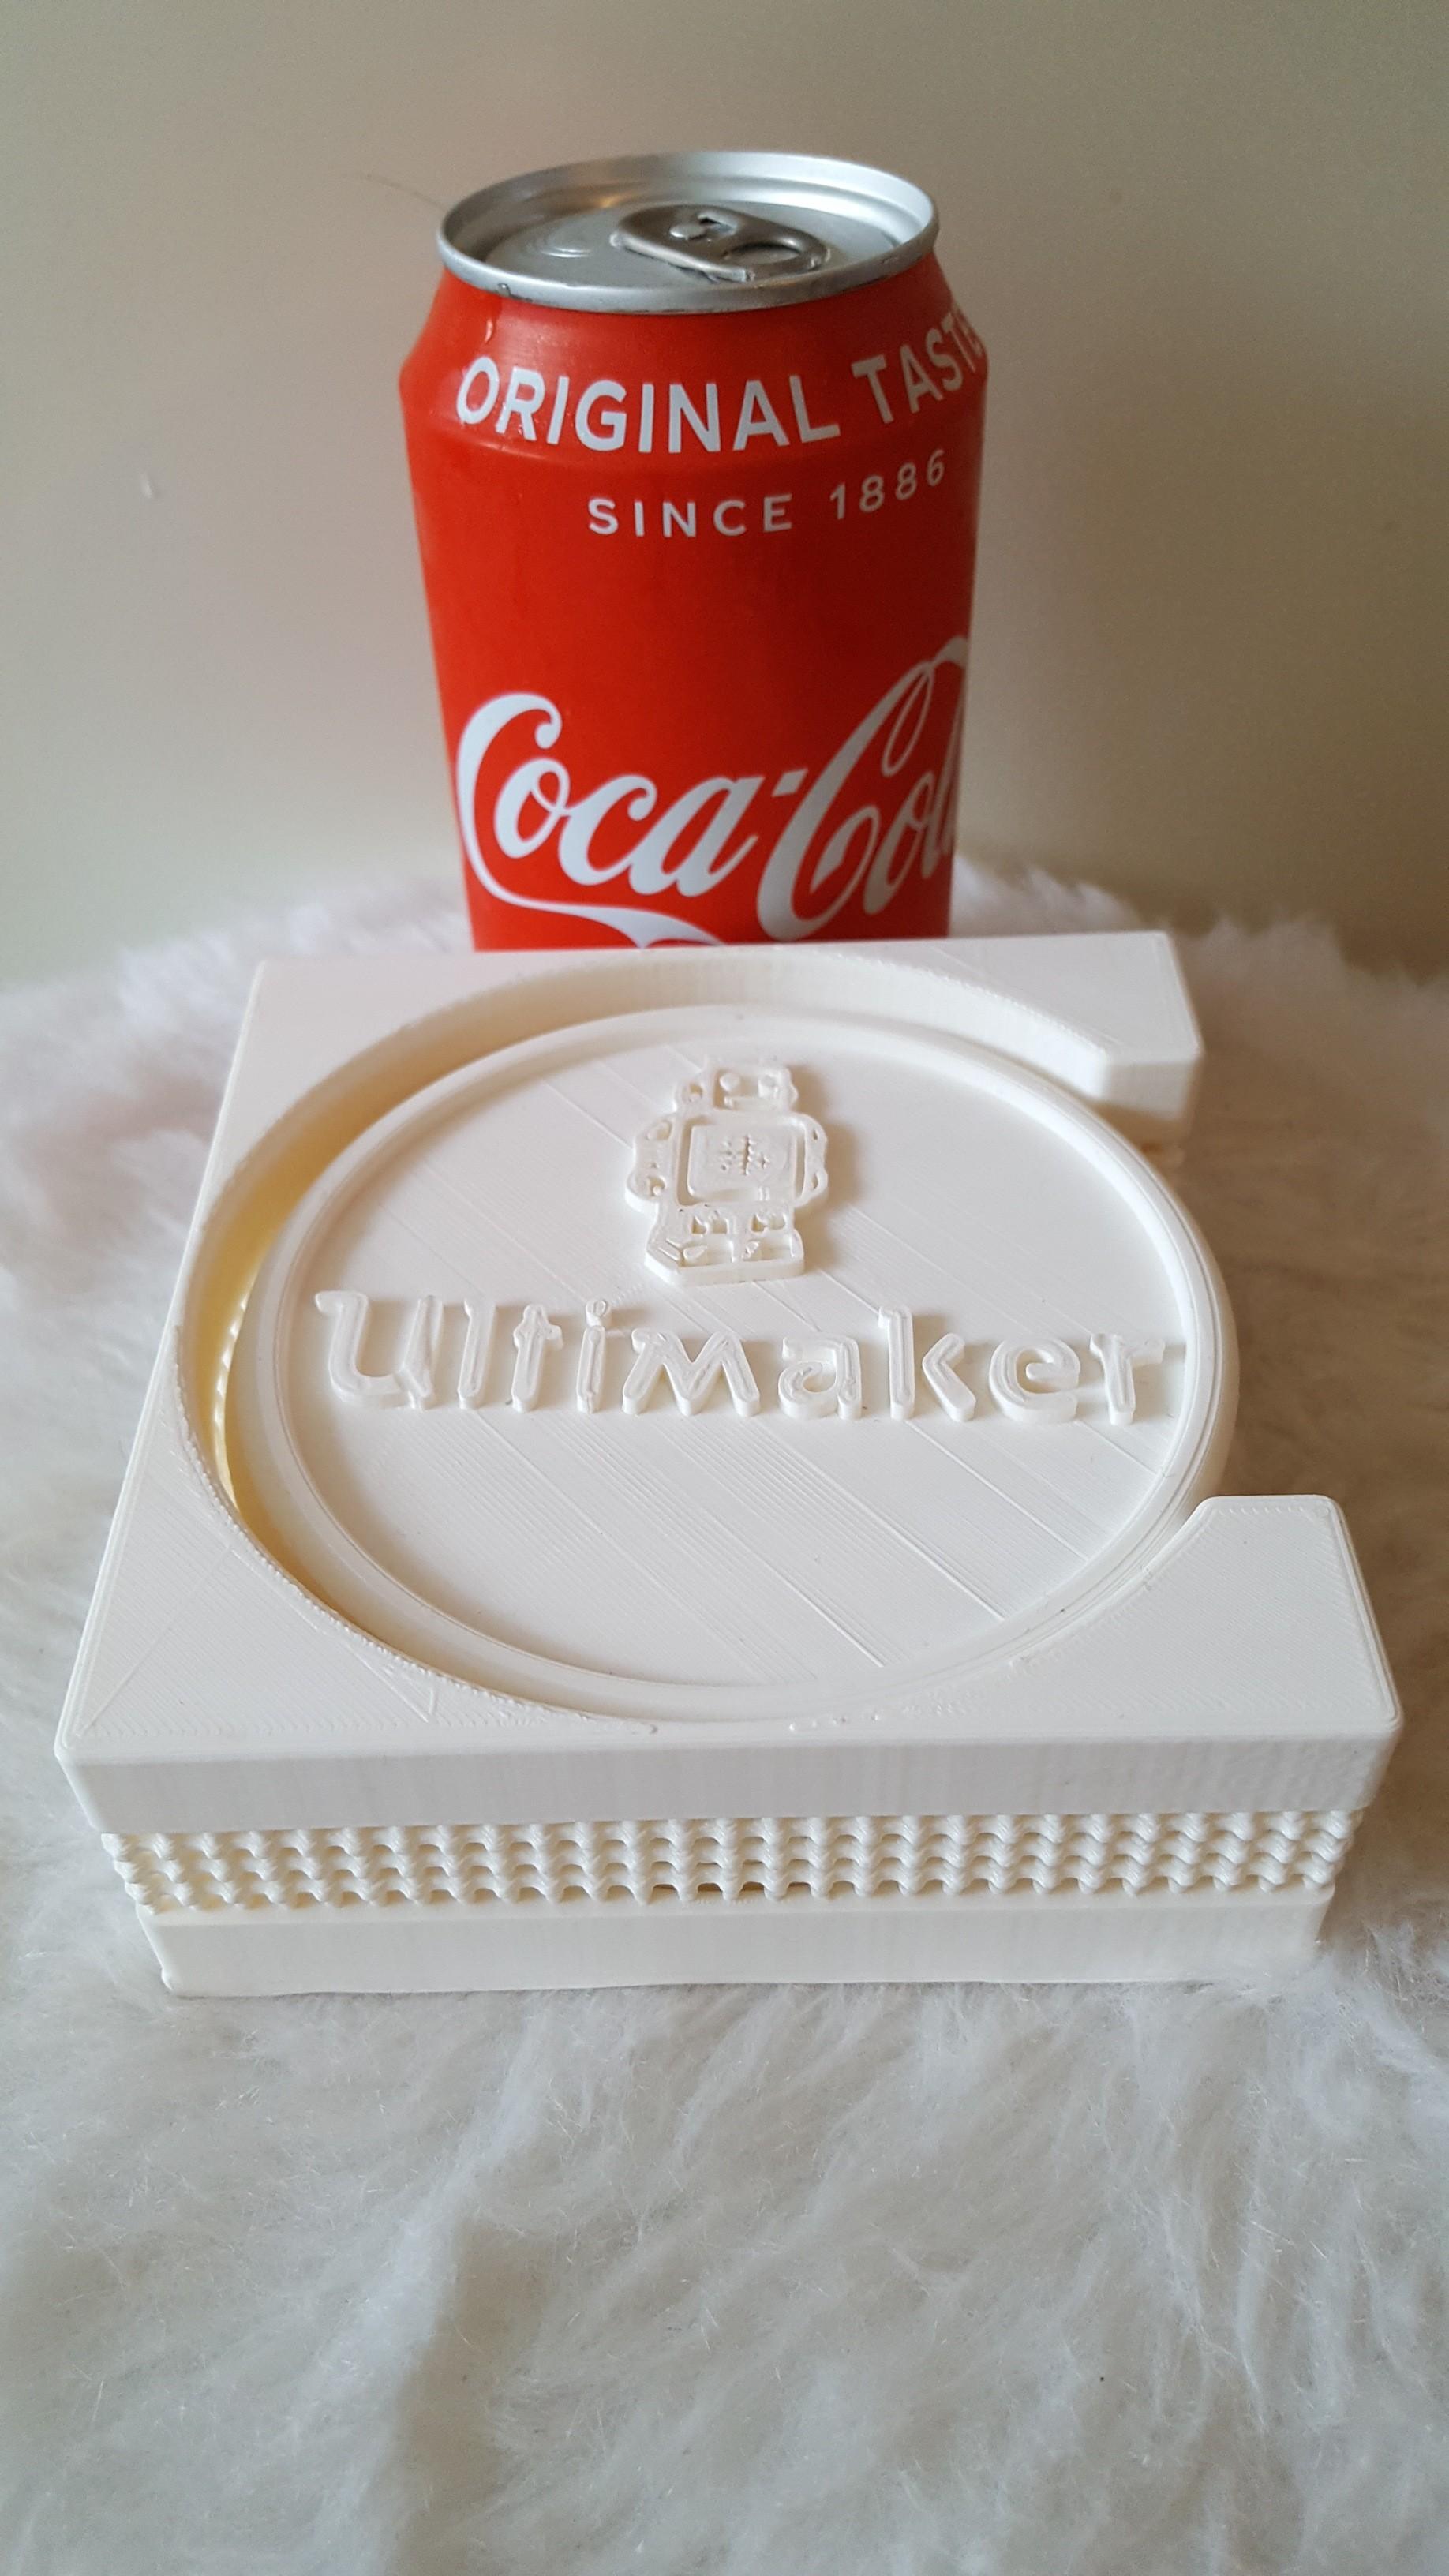 20190407_191234.jpg Download free STL file Coasterholder lattice pattern • 3D printer template, IdeaLab